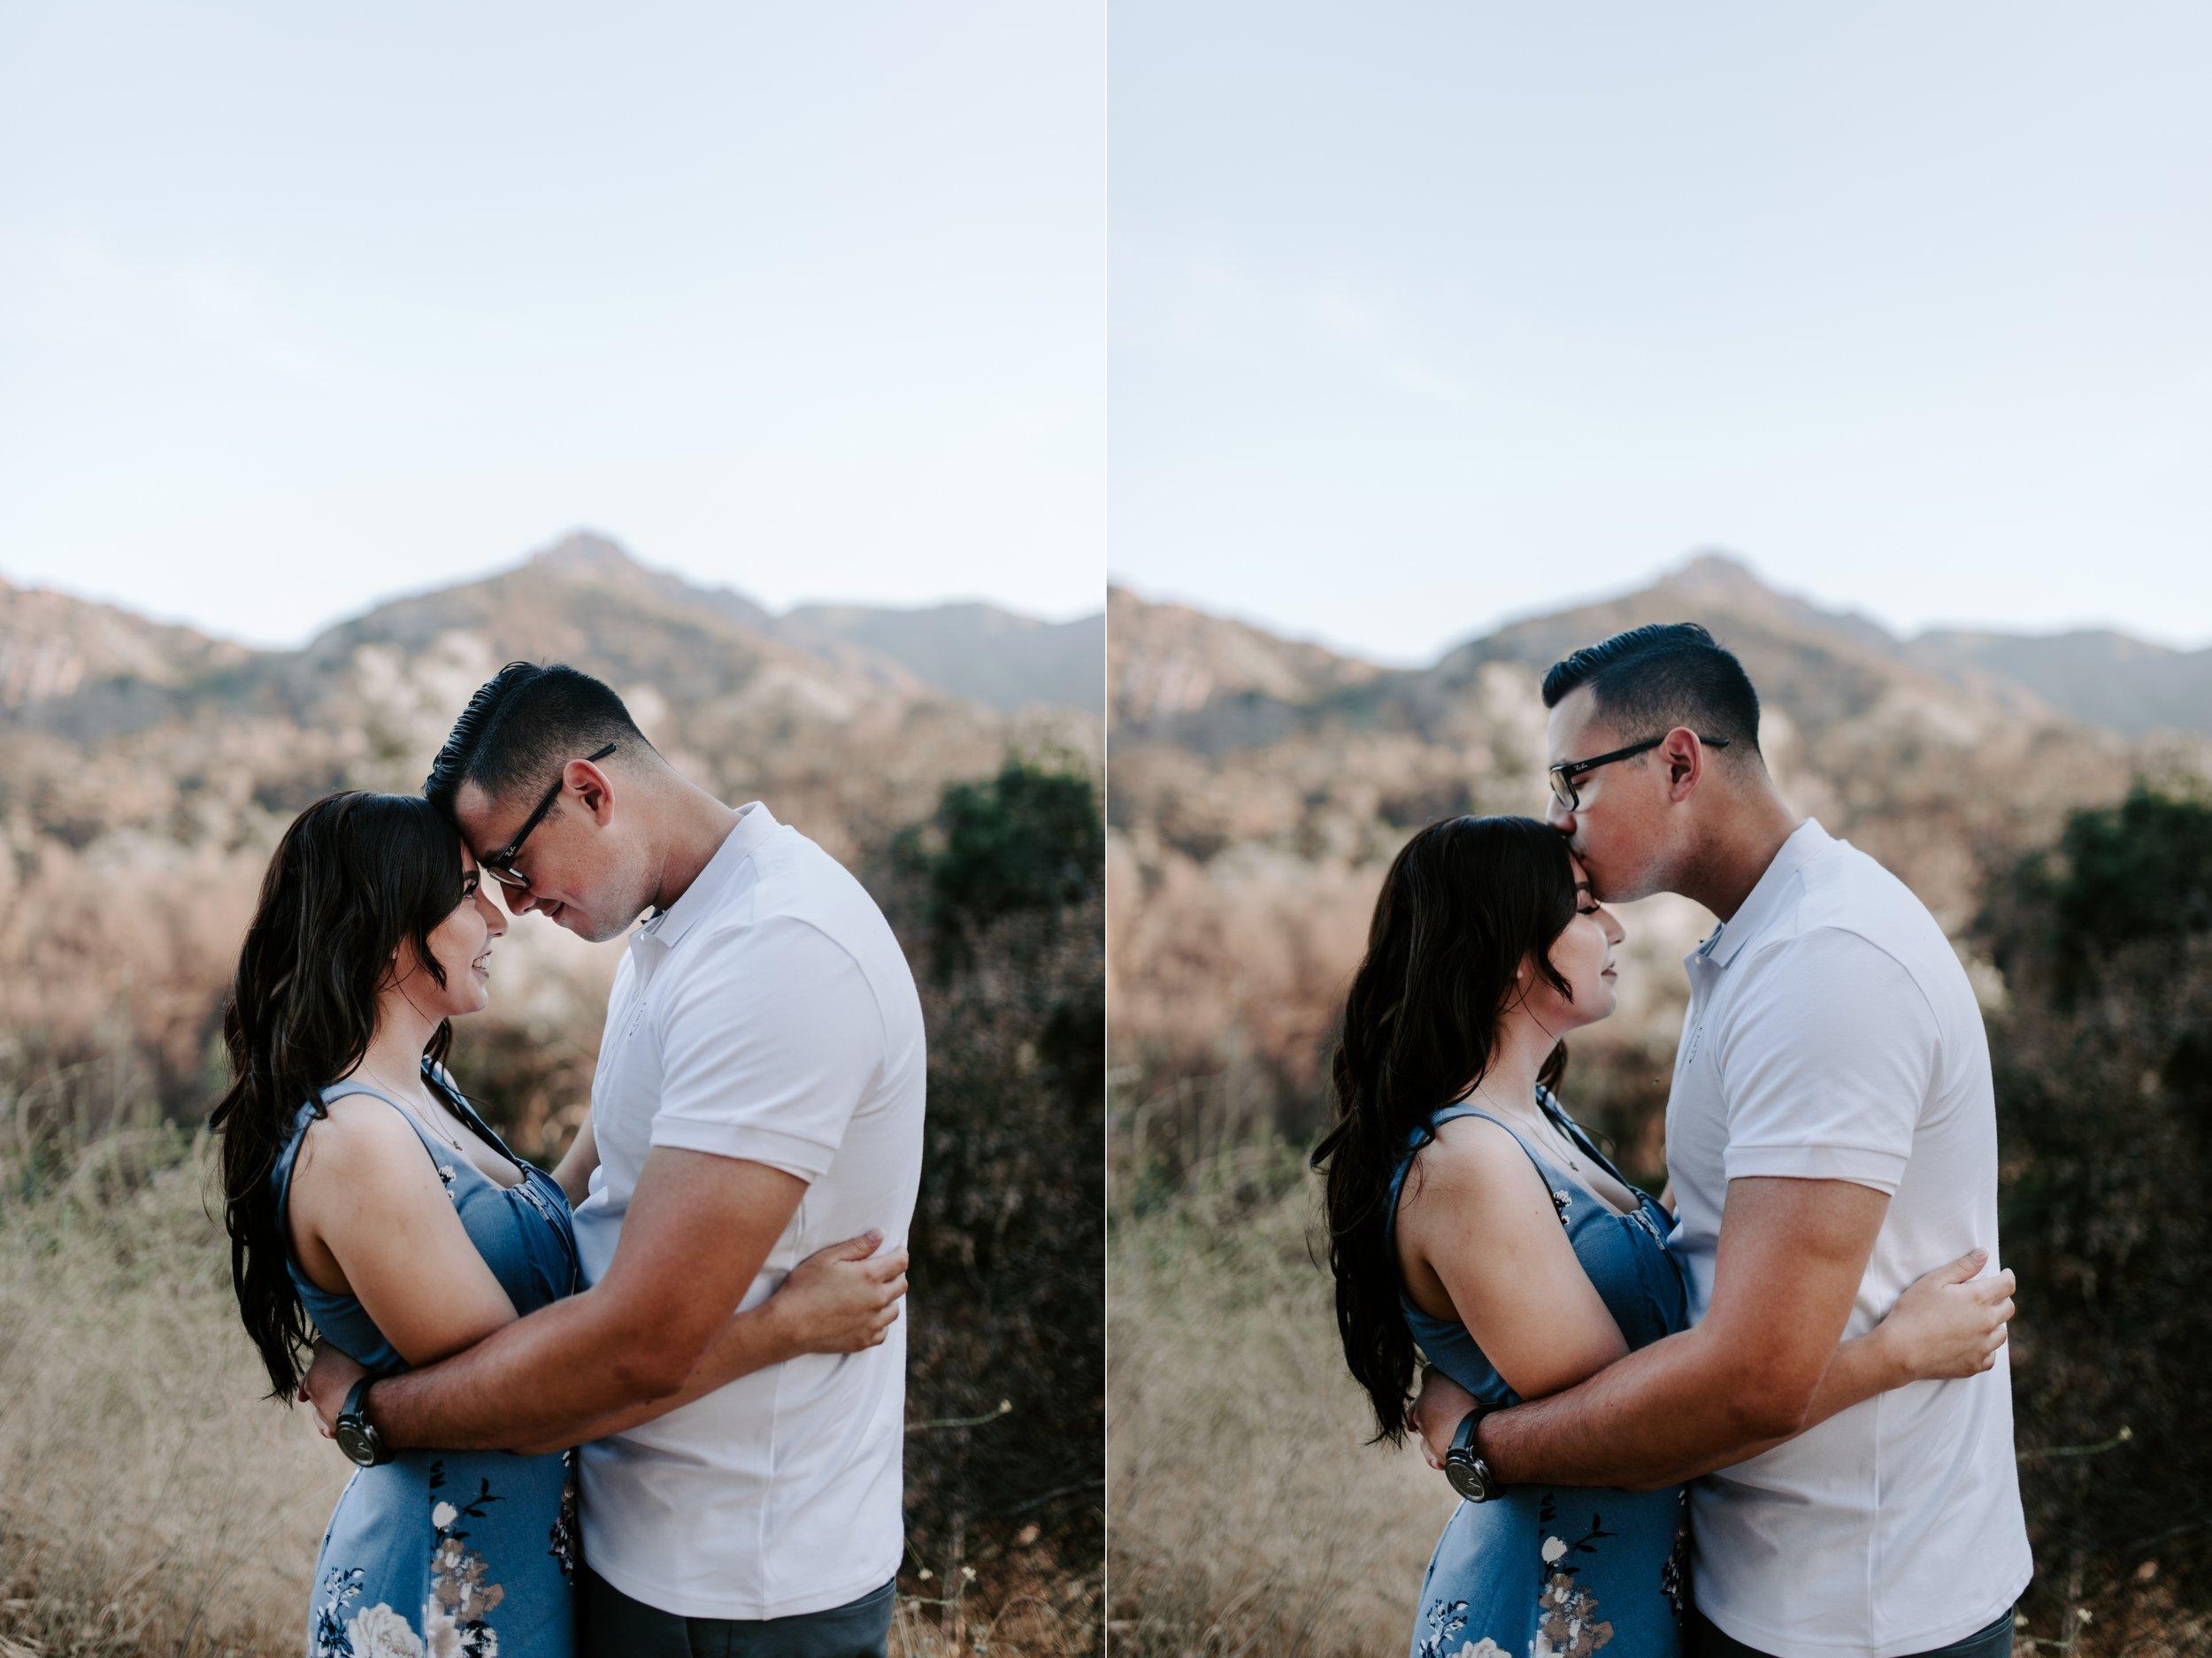 Katelyn Faye Photography | www.katelynfaye.com | Las Vegas Wedding Photographer | Malibu Creek State Park Engagements | J&N (5 of 33)-side.jpg